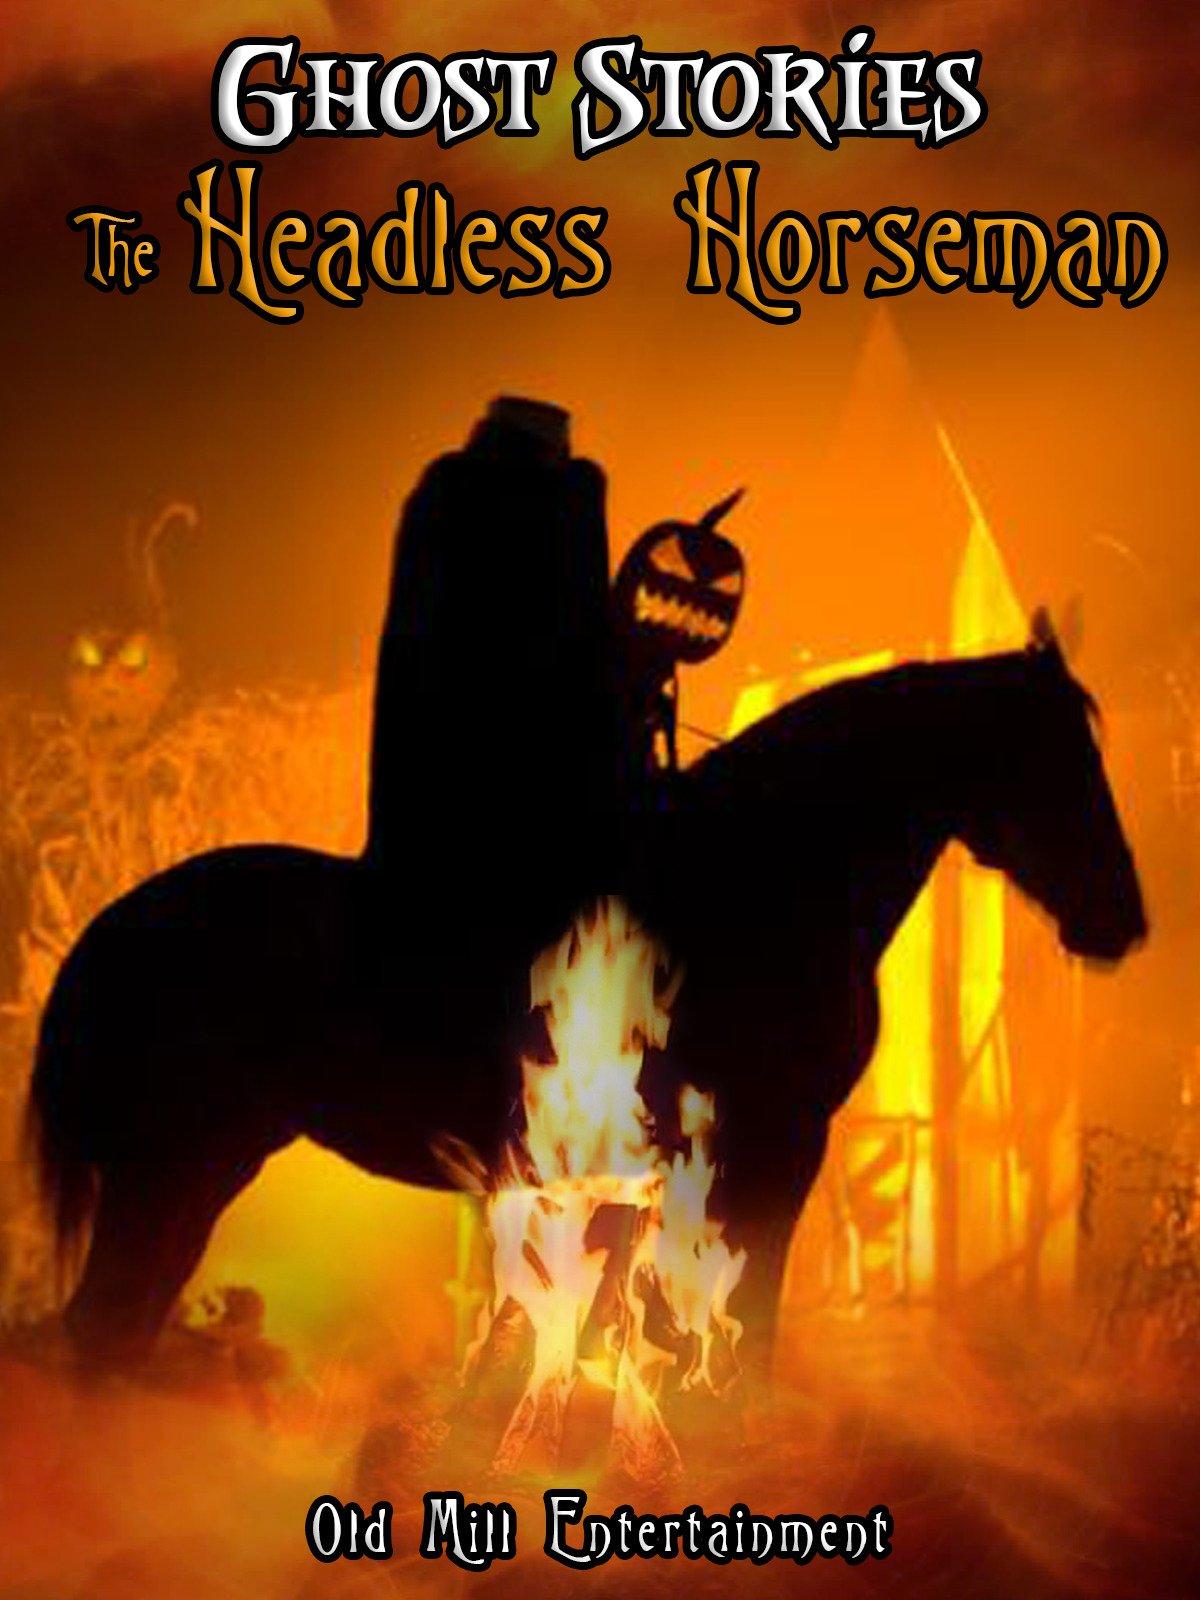 Ghost Stories: The Headless Horseman